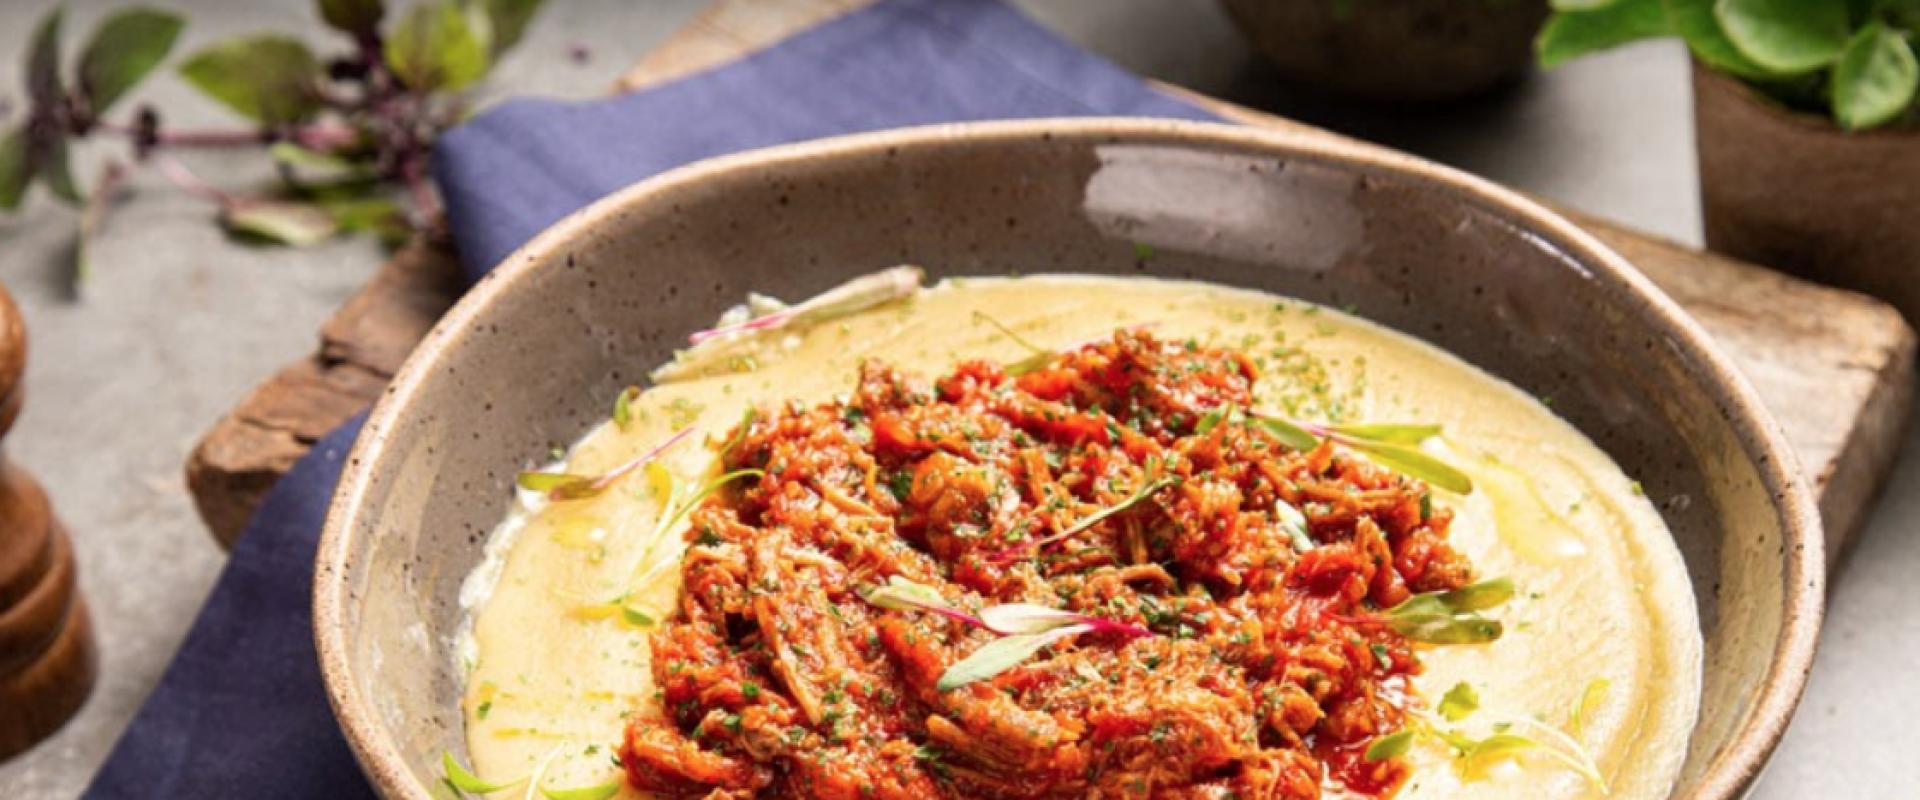 Polenta com ragu de pastrami / Organico Gourmet / comida conforto